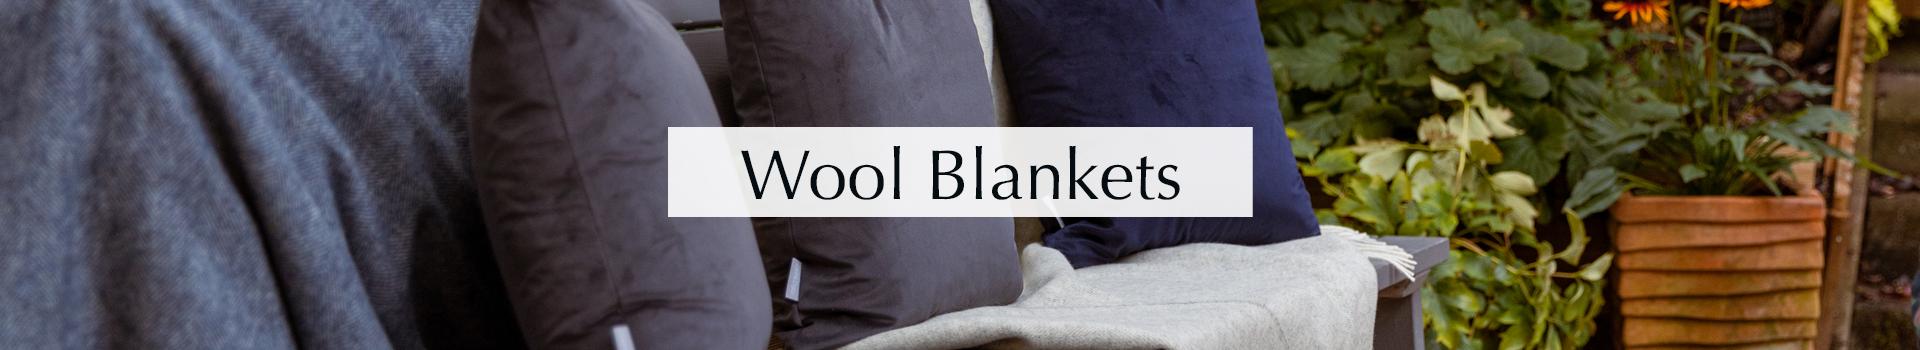 wool-balnkets.png